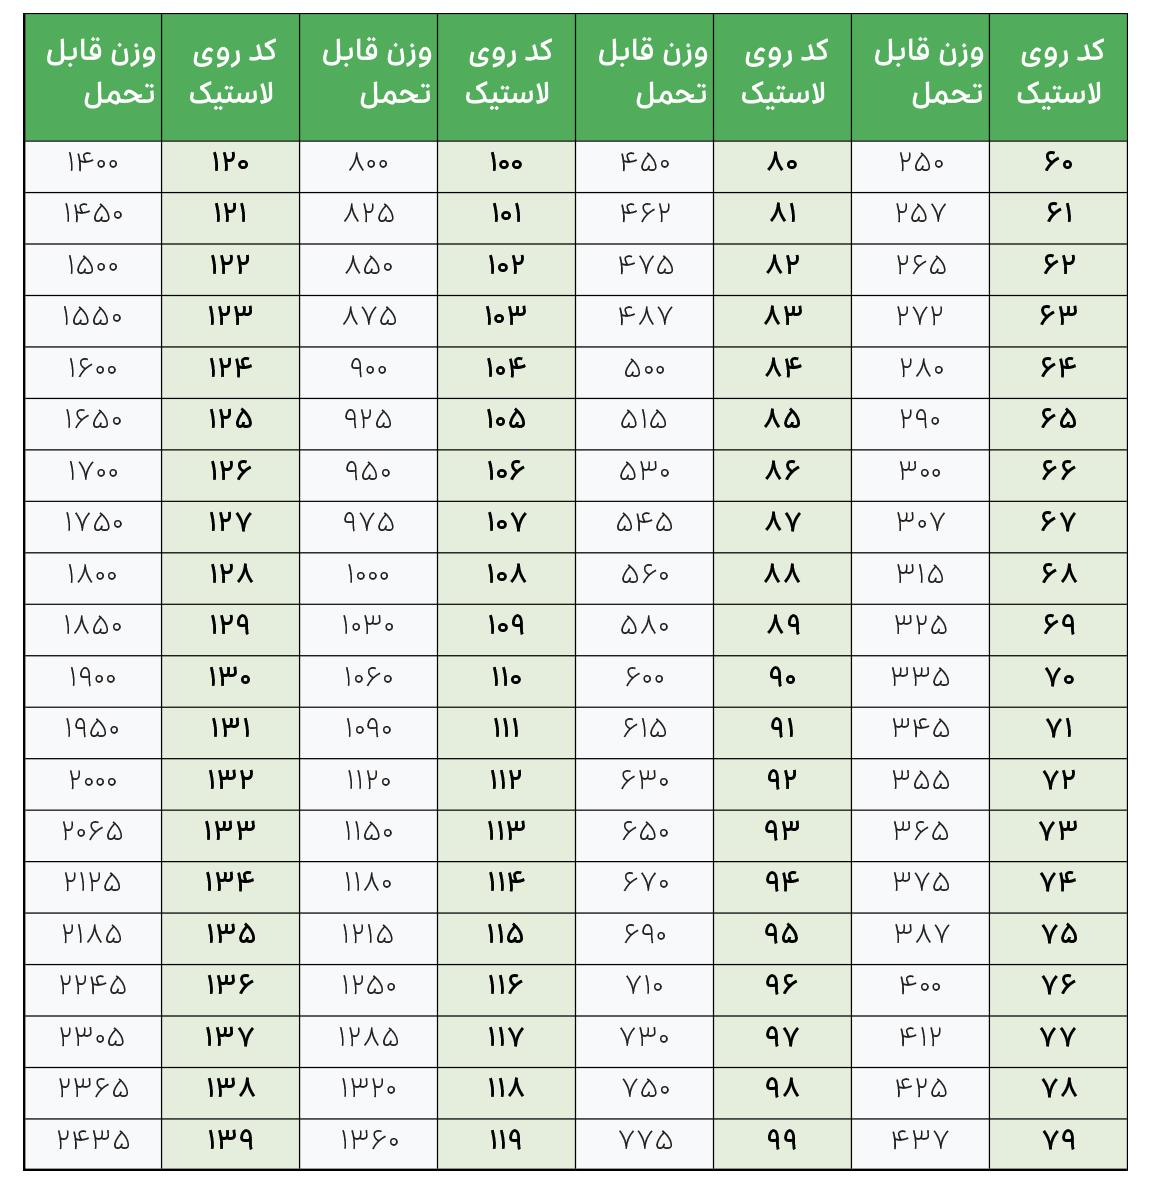 شاخص وزن قابل تحمل توسط هر تایر خودرو Load Index